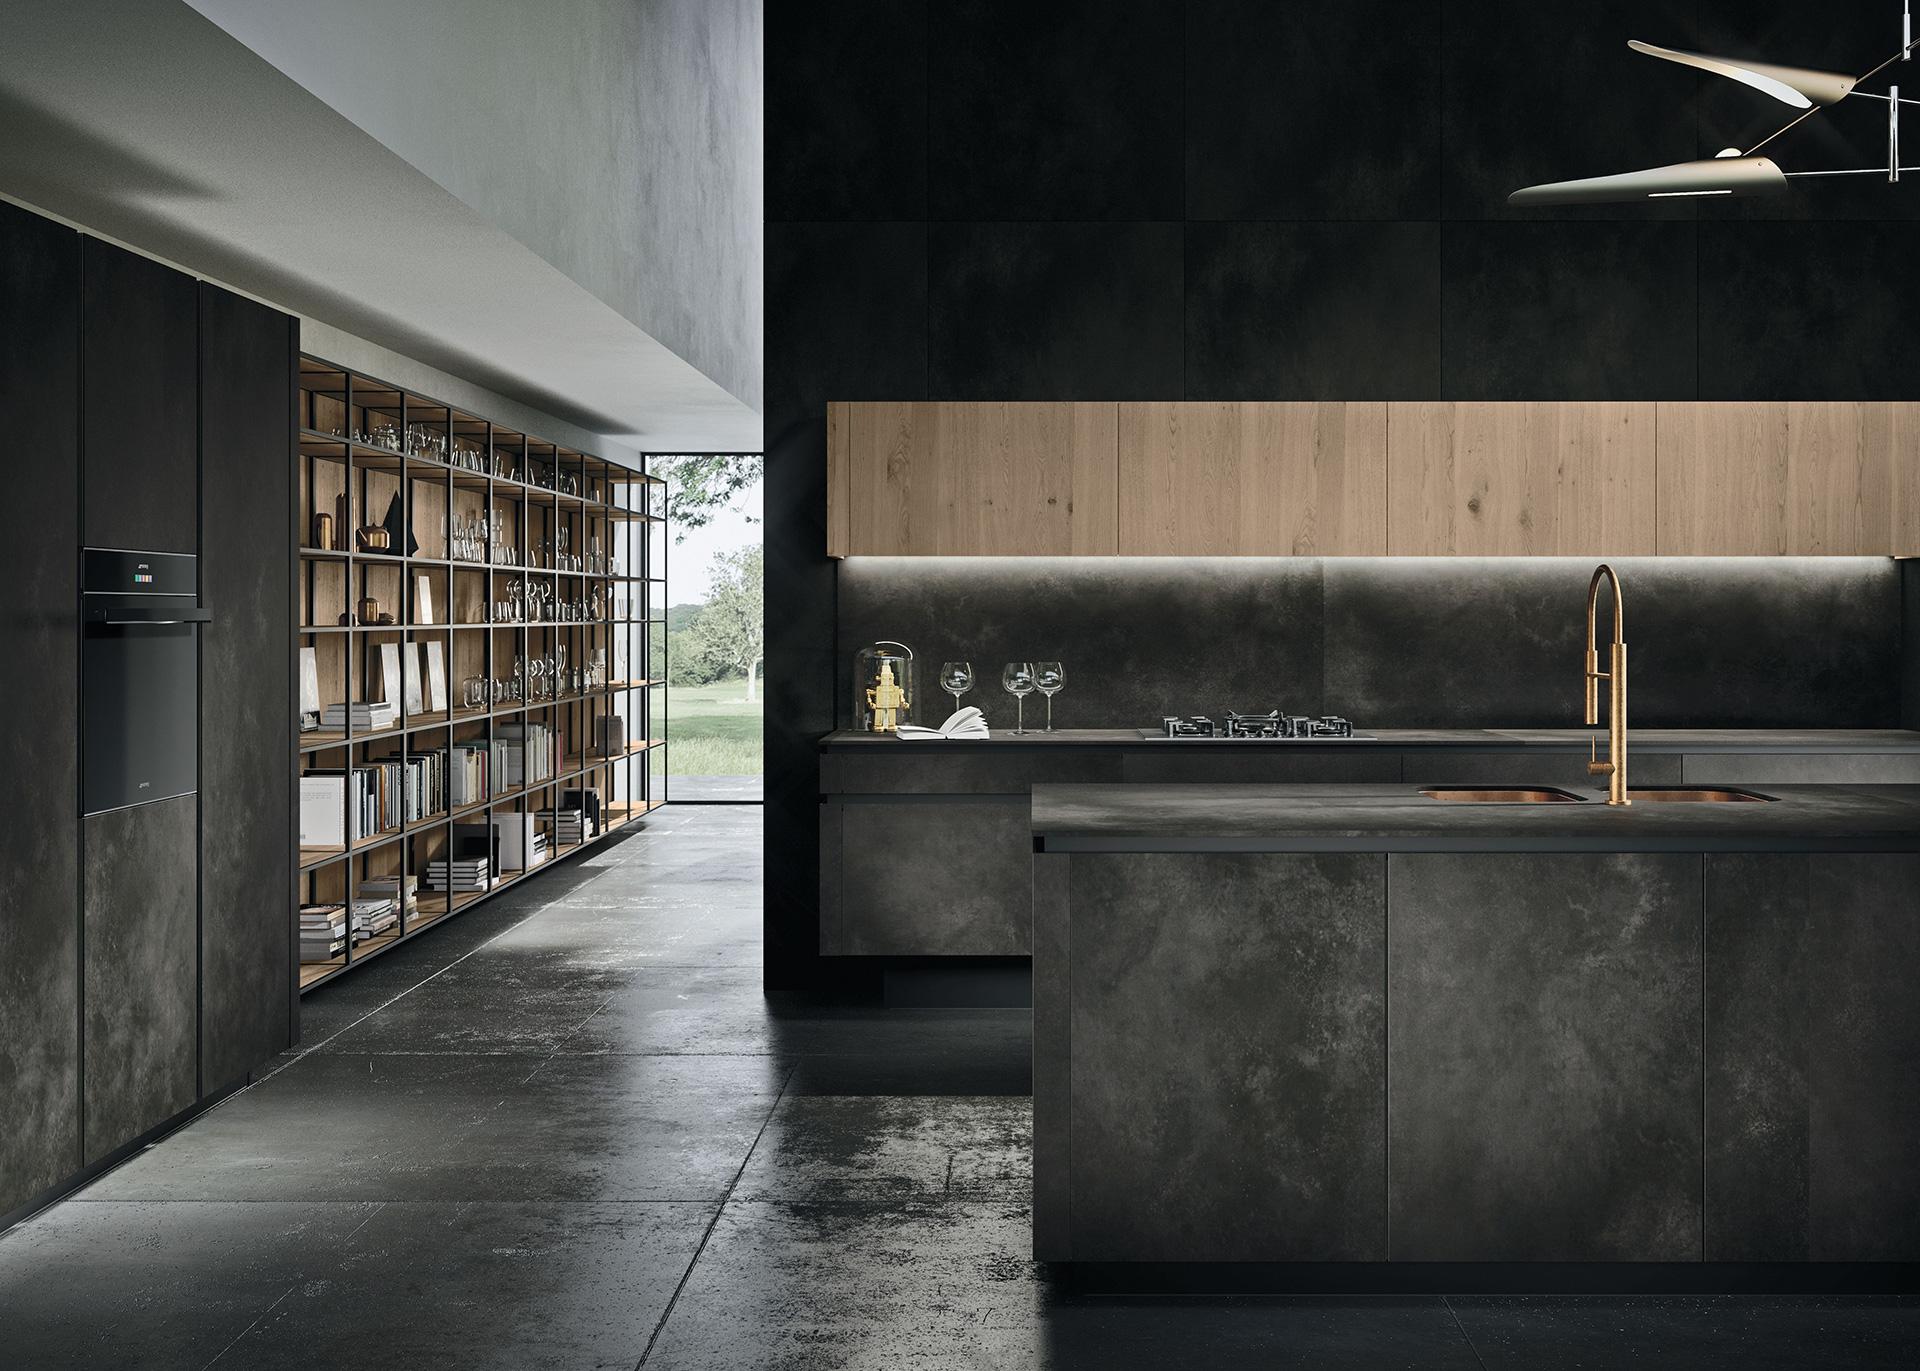 cucina-Way-dettaglio-ceramica-ossido-nero-1